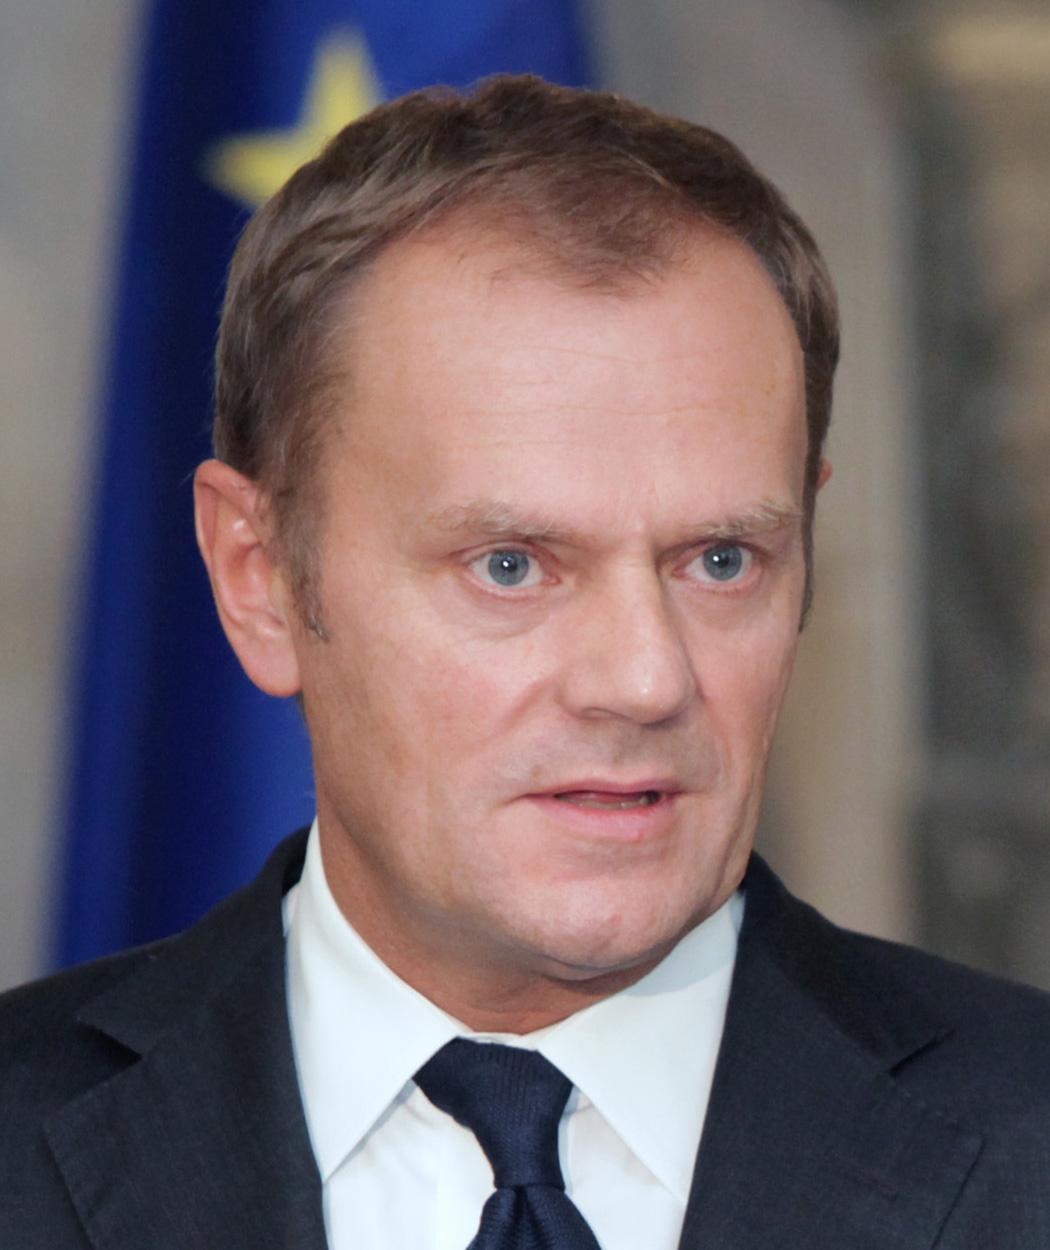 Donald tusk wikipedia la enciclopedia libre for Presidente del consejo europeo